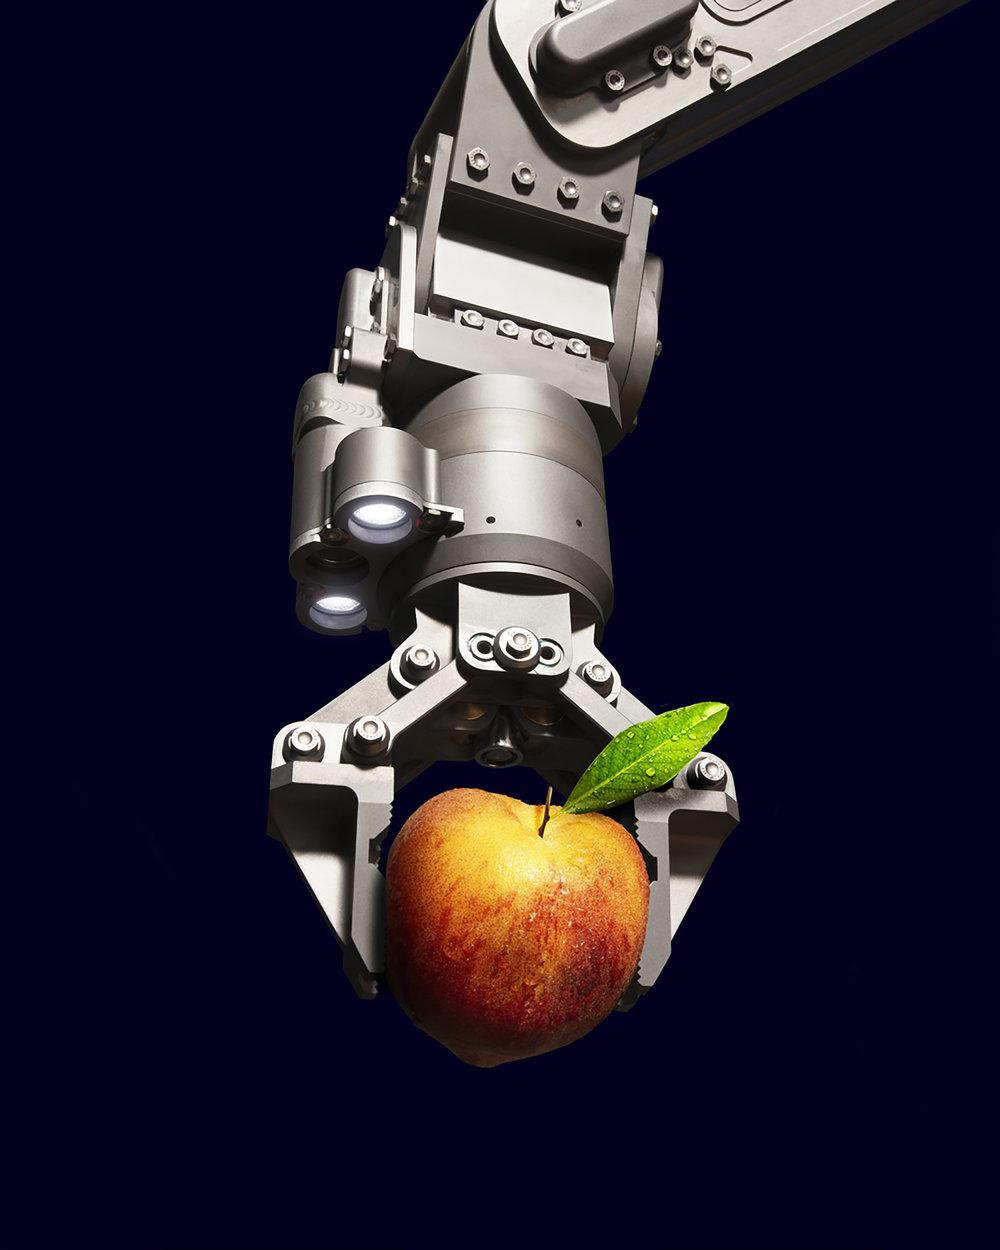 Schilling Robotics TITAN 4 holding a peach